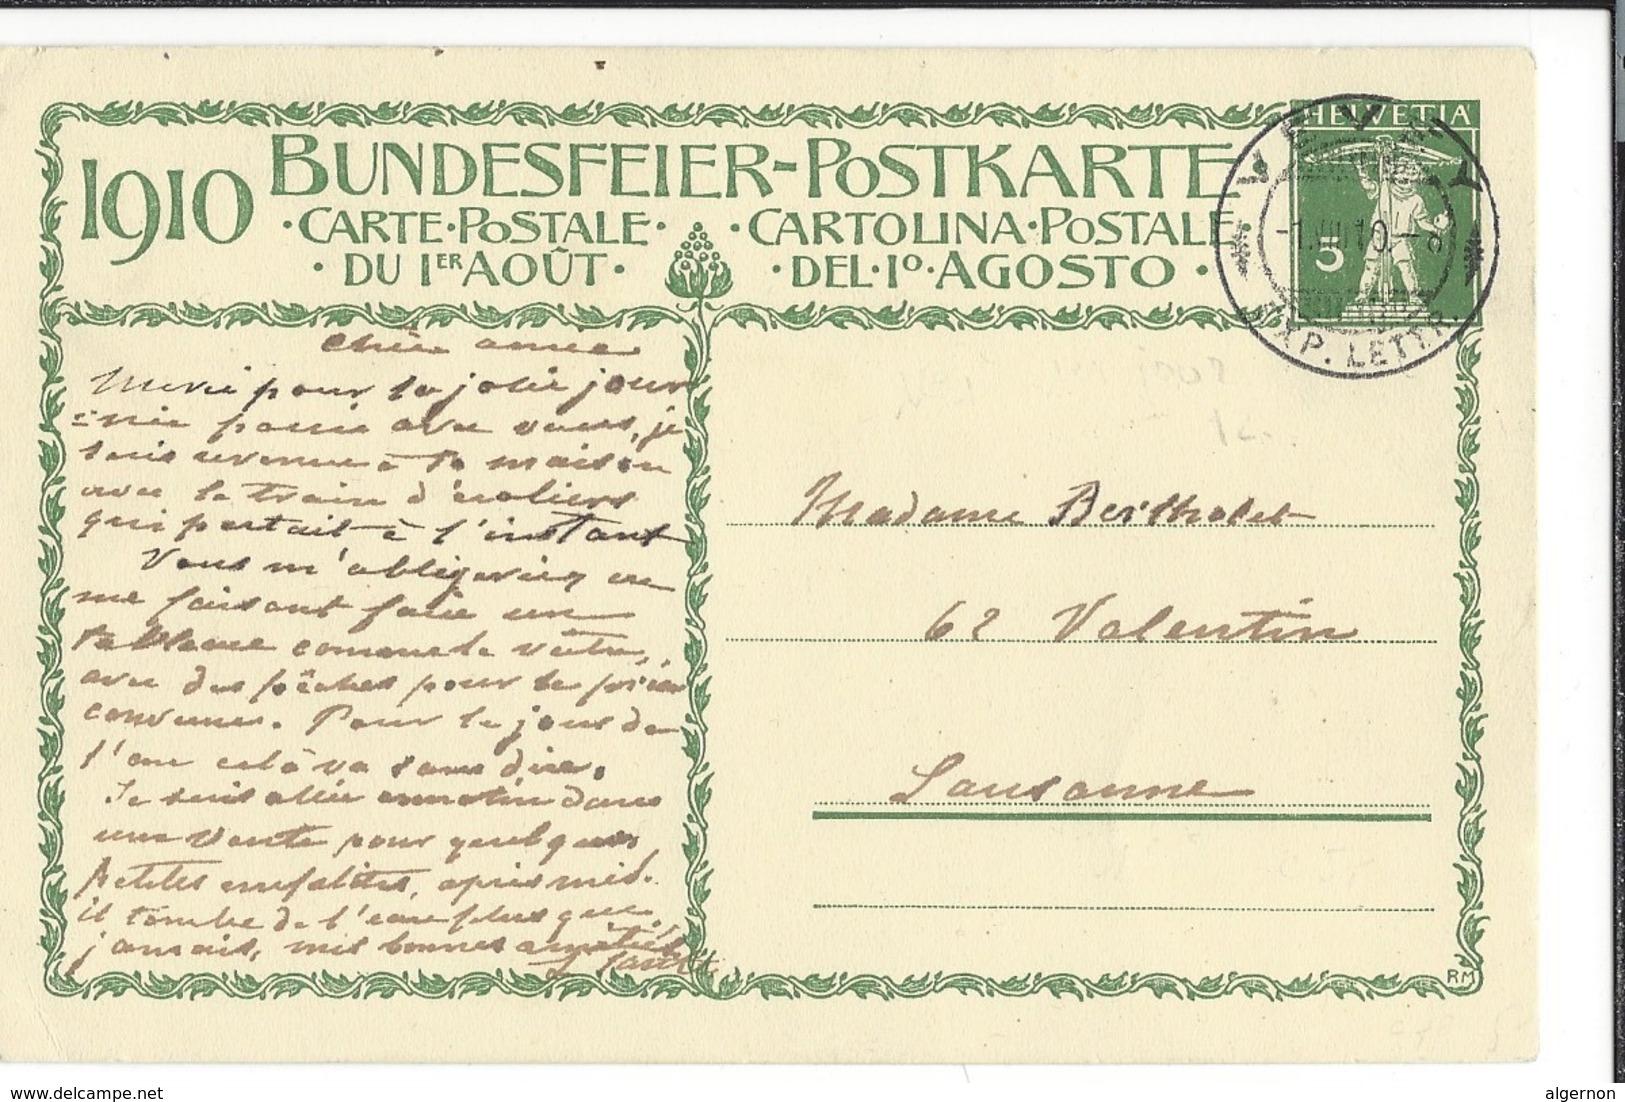 N 48 - Carte N°1 Fête Nationale 1910 Vevey 01.08.1910 Bundesfeier Postkarte 1er Jour - Interi Postali